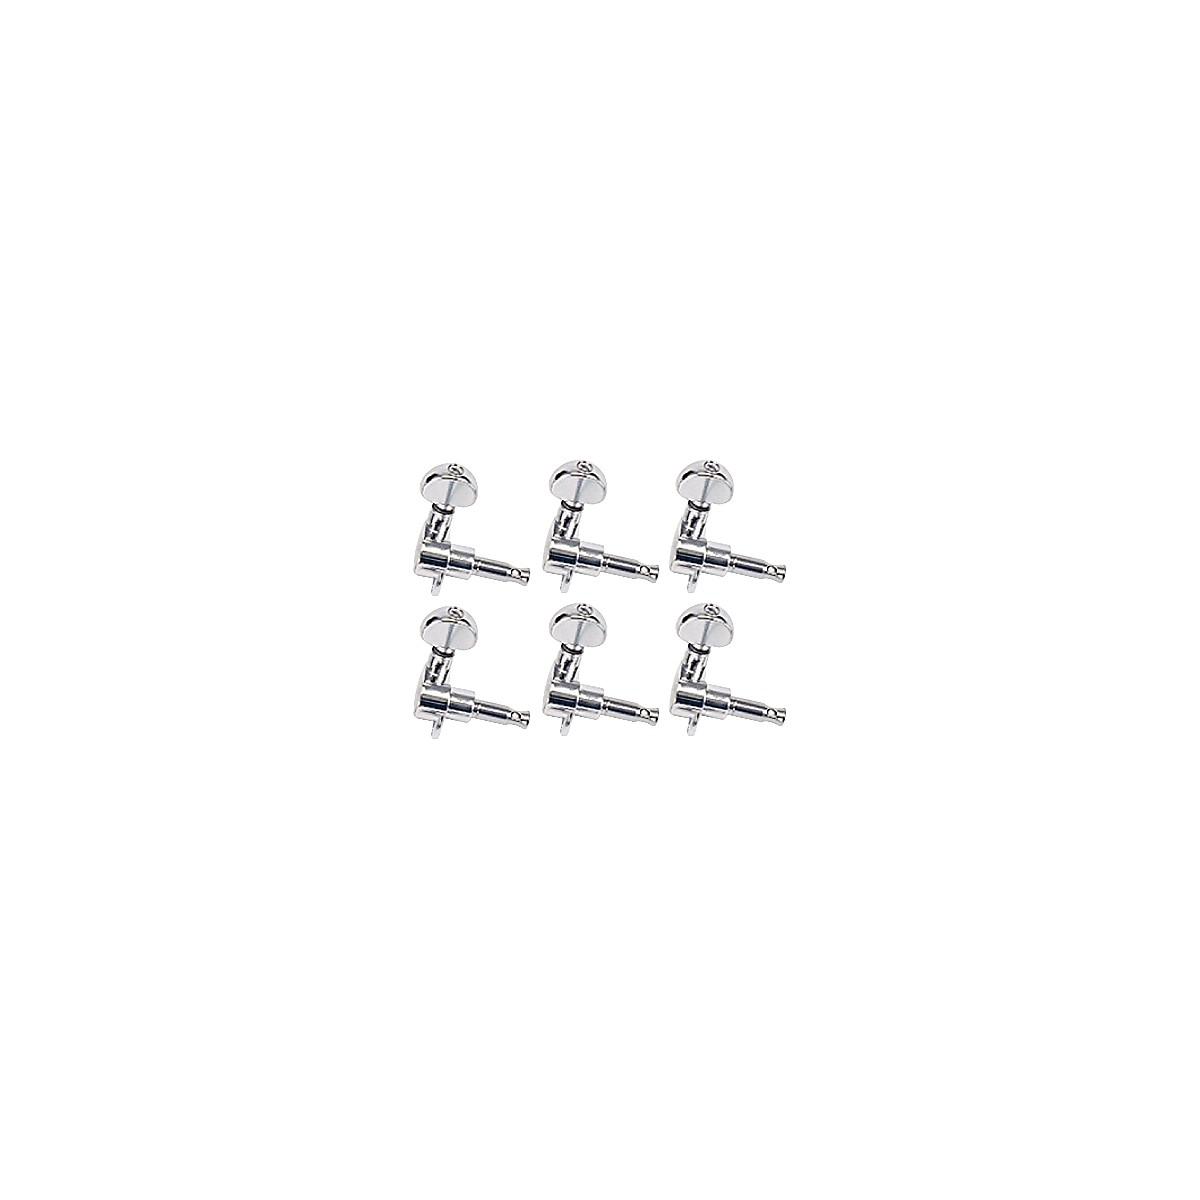 Grover-Trophy 205C6 Mini Rotomatics® 6-In-Line Guitar Tuning Keys